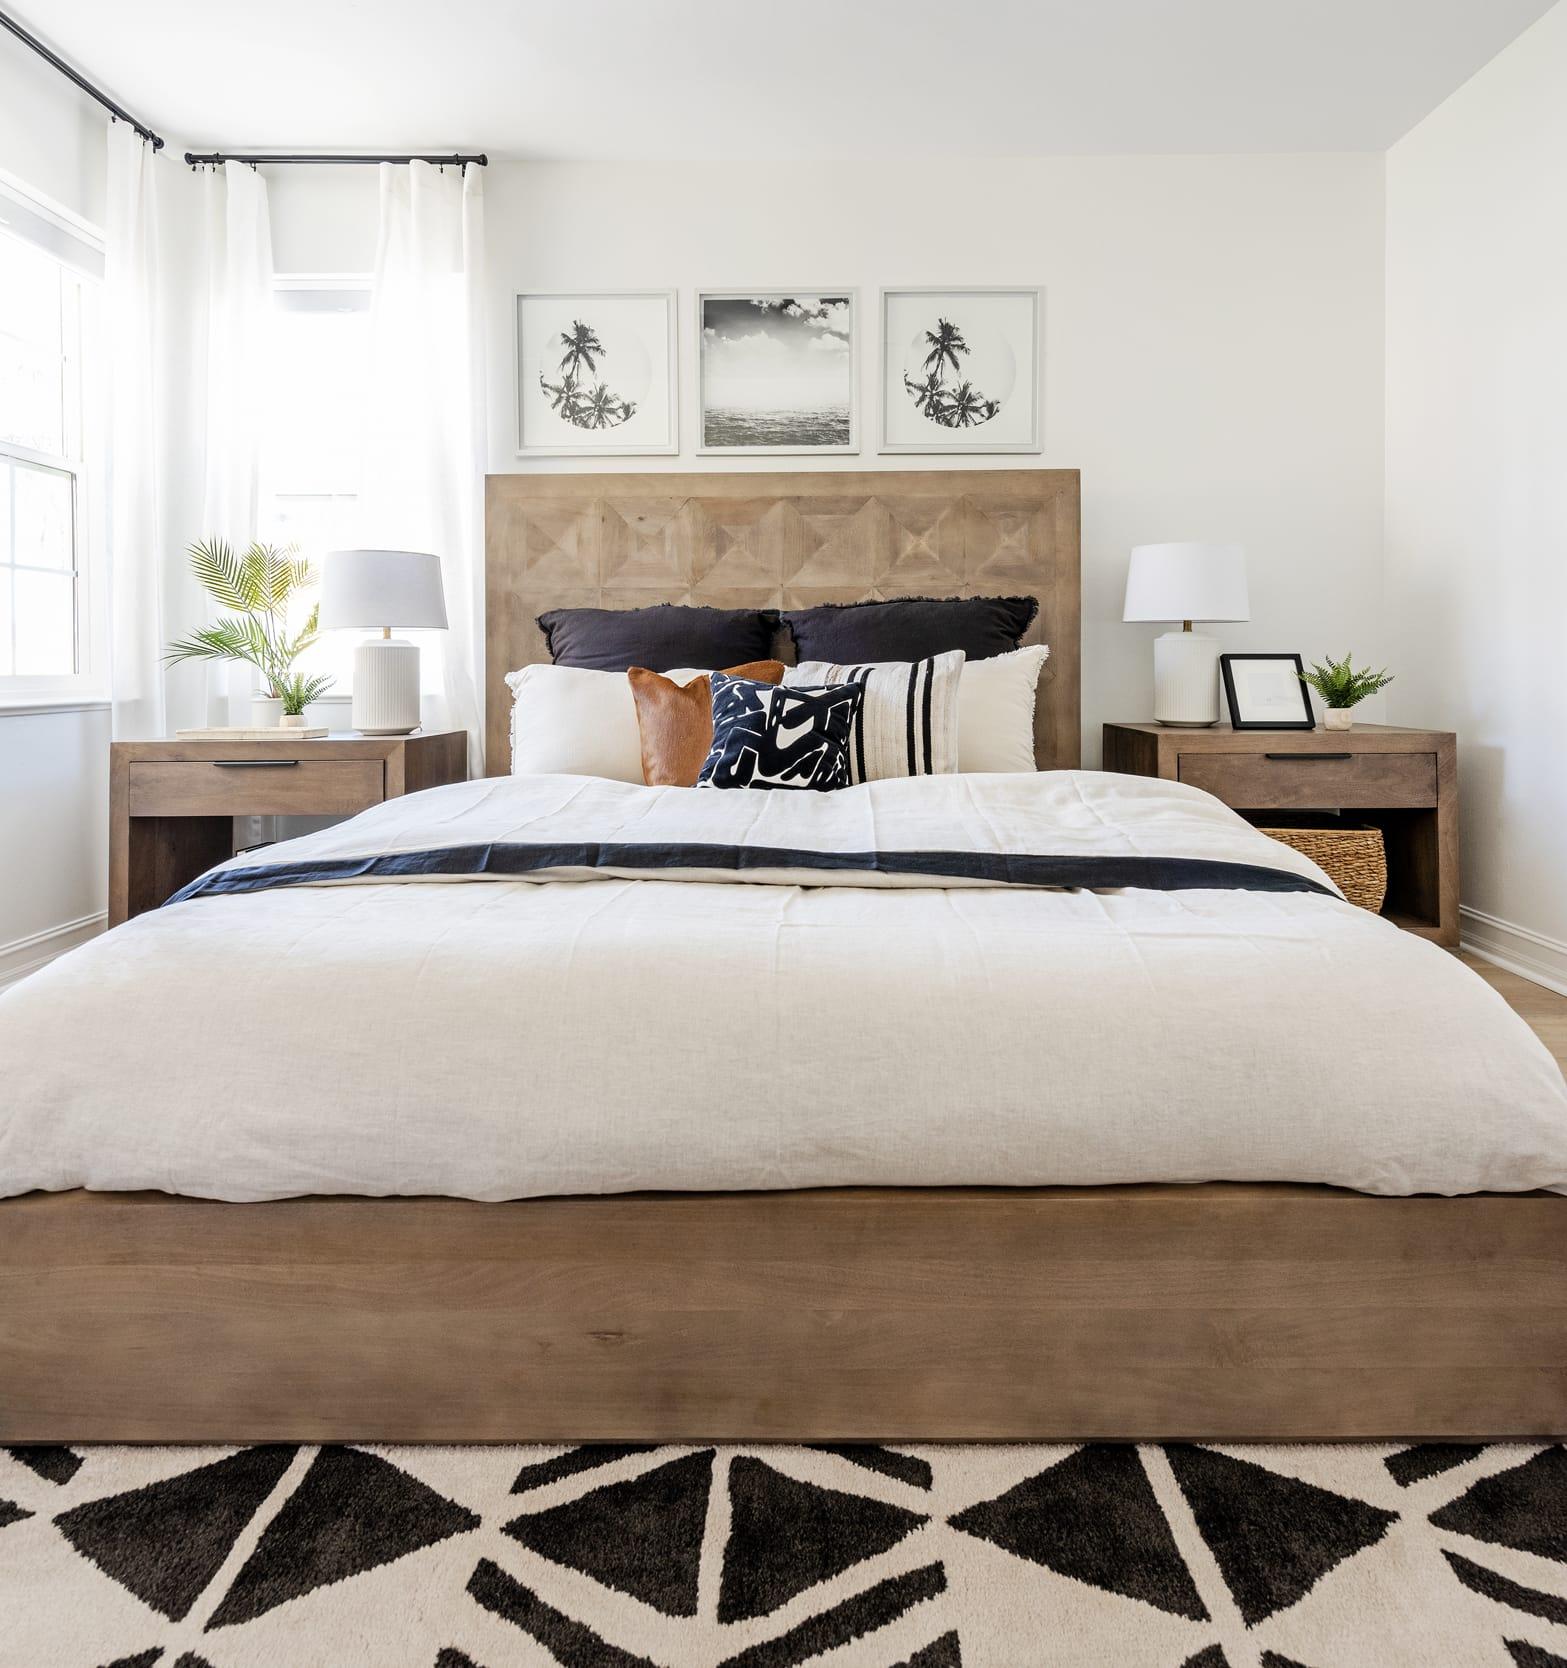 Bedroom Beige Black Bedsheets Rug Pillows Wood Dresser Headboard Head On